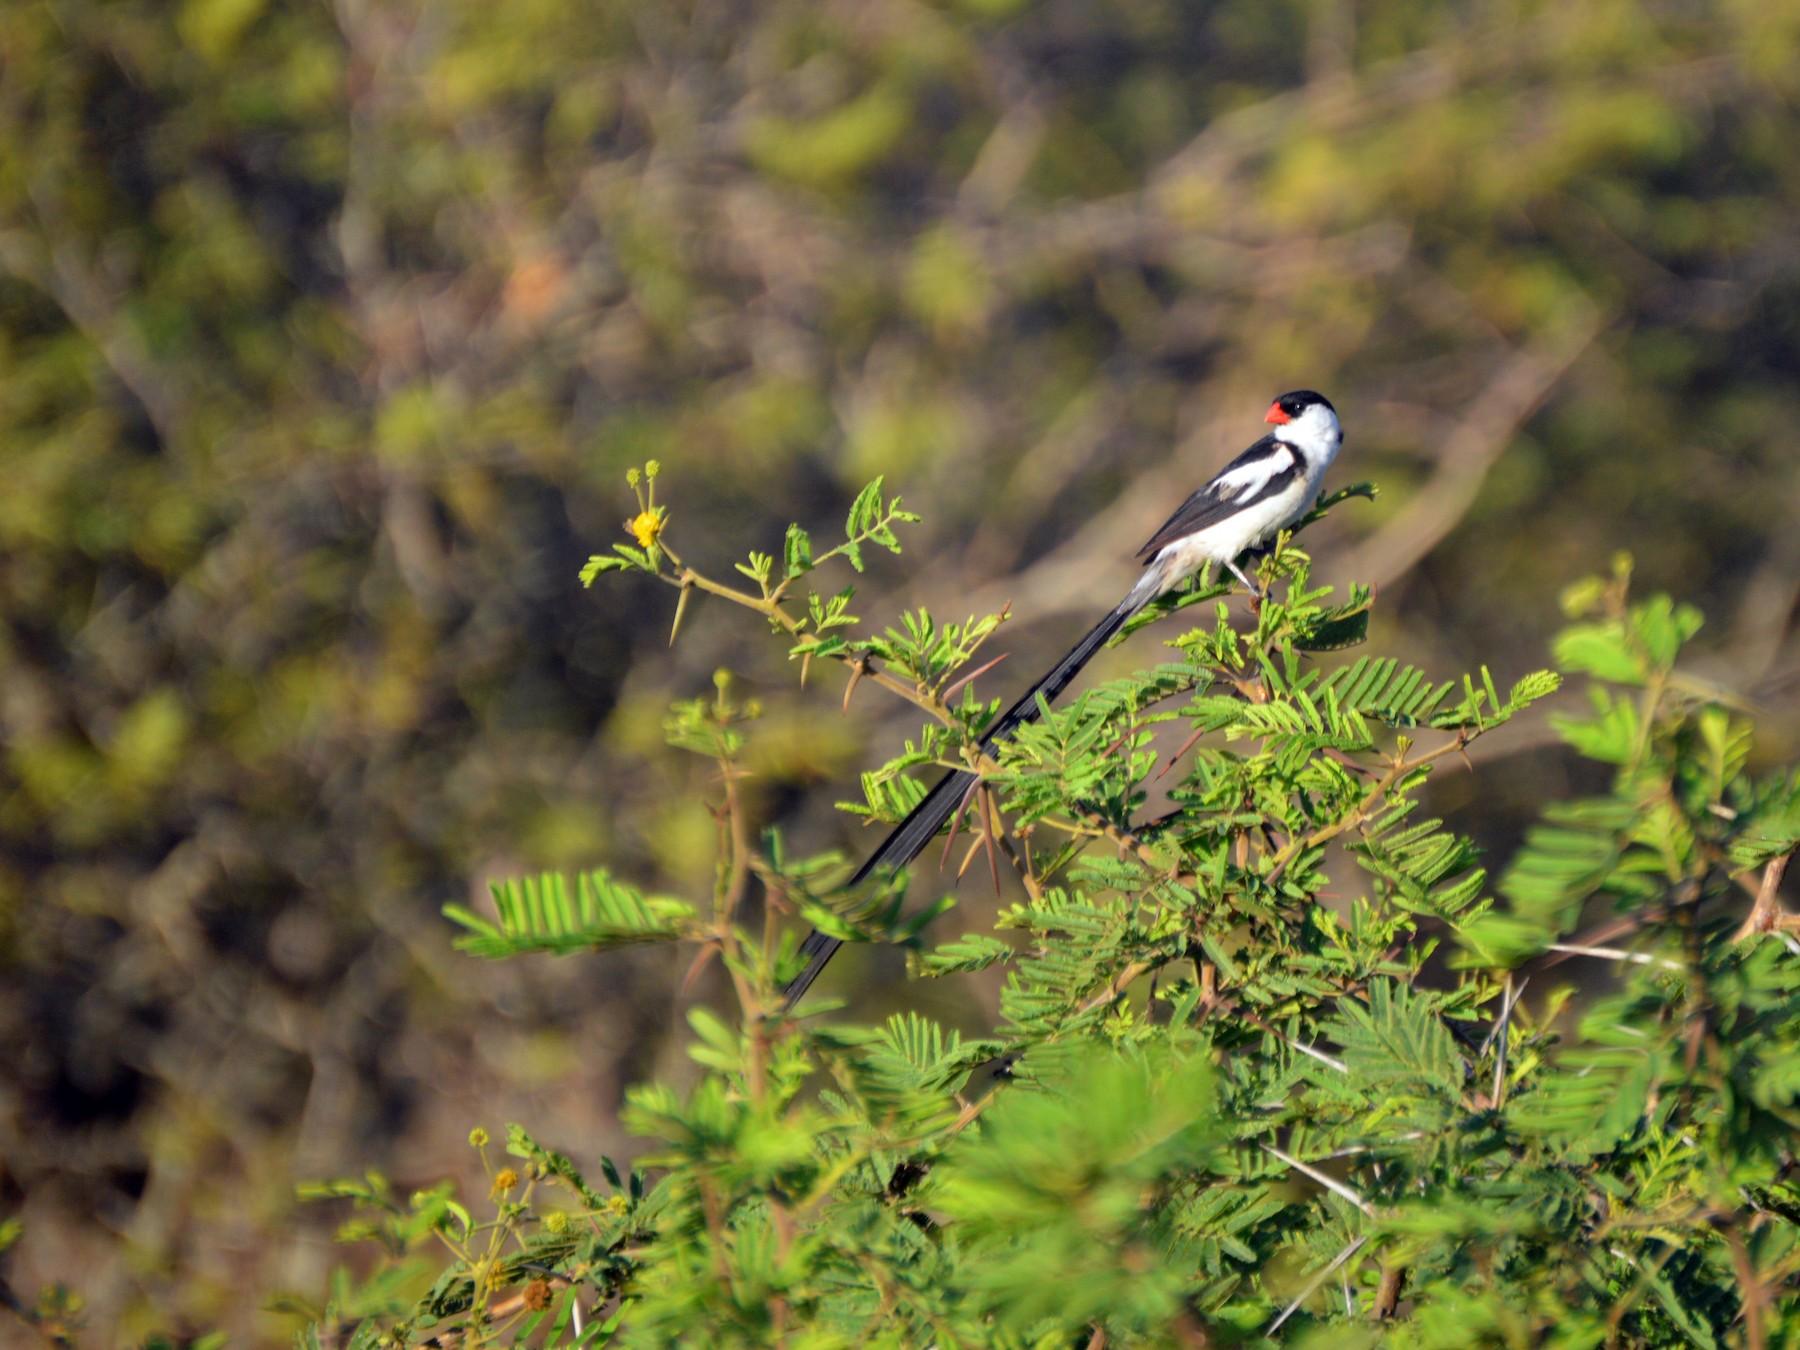 Pin-tailed Whydah - Christopher Gilbert